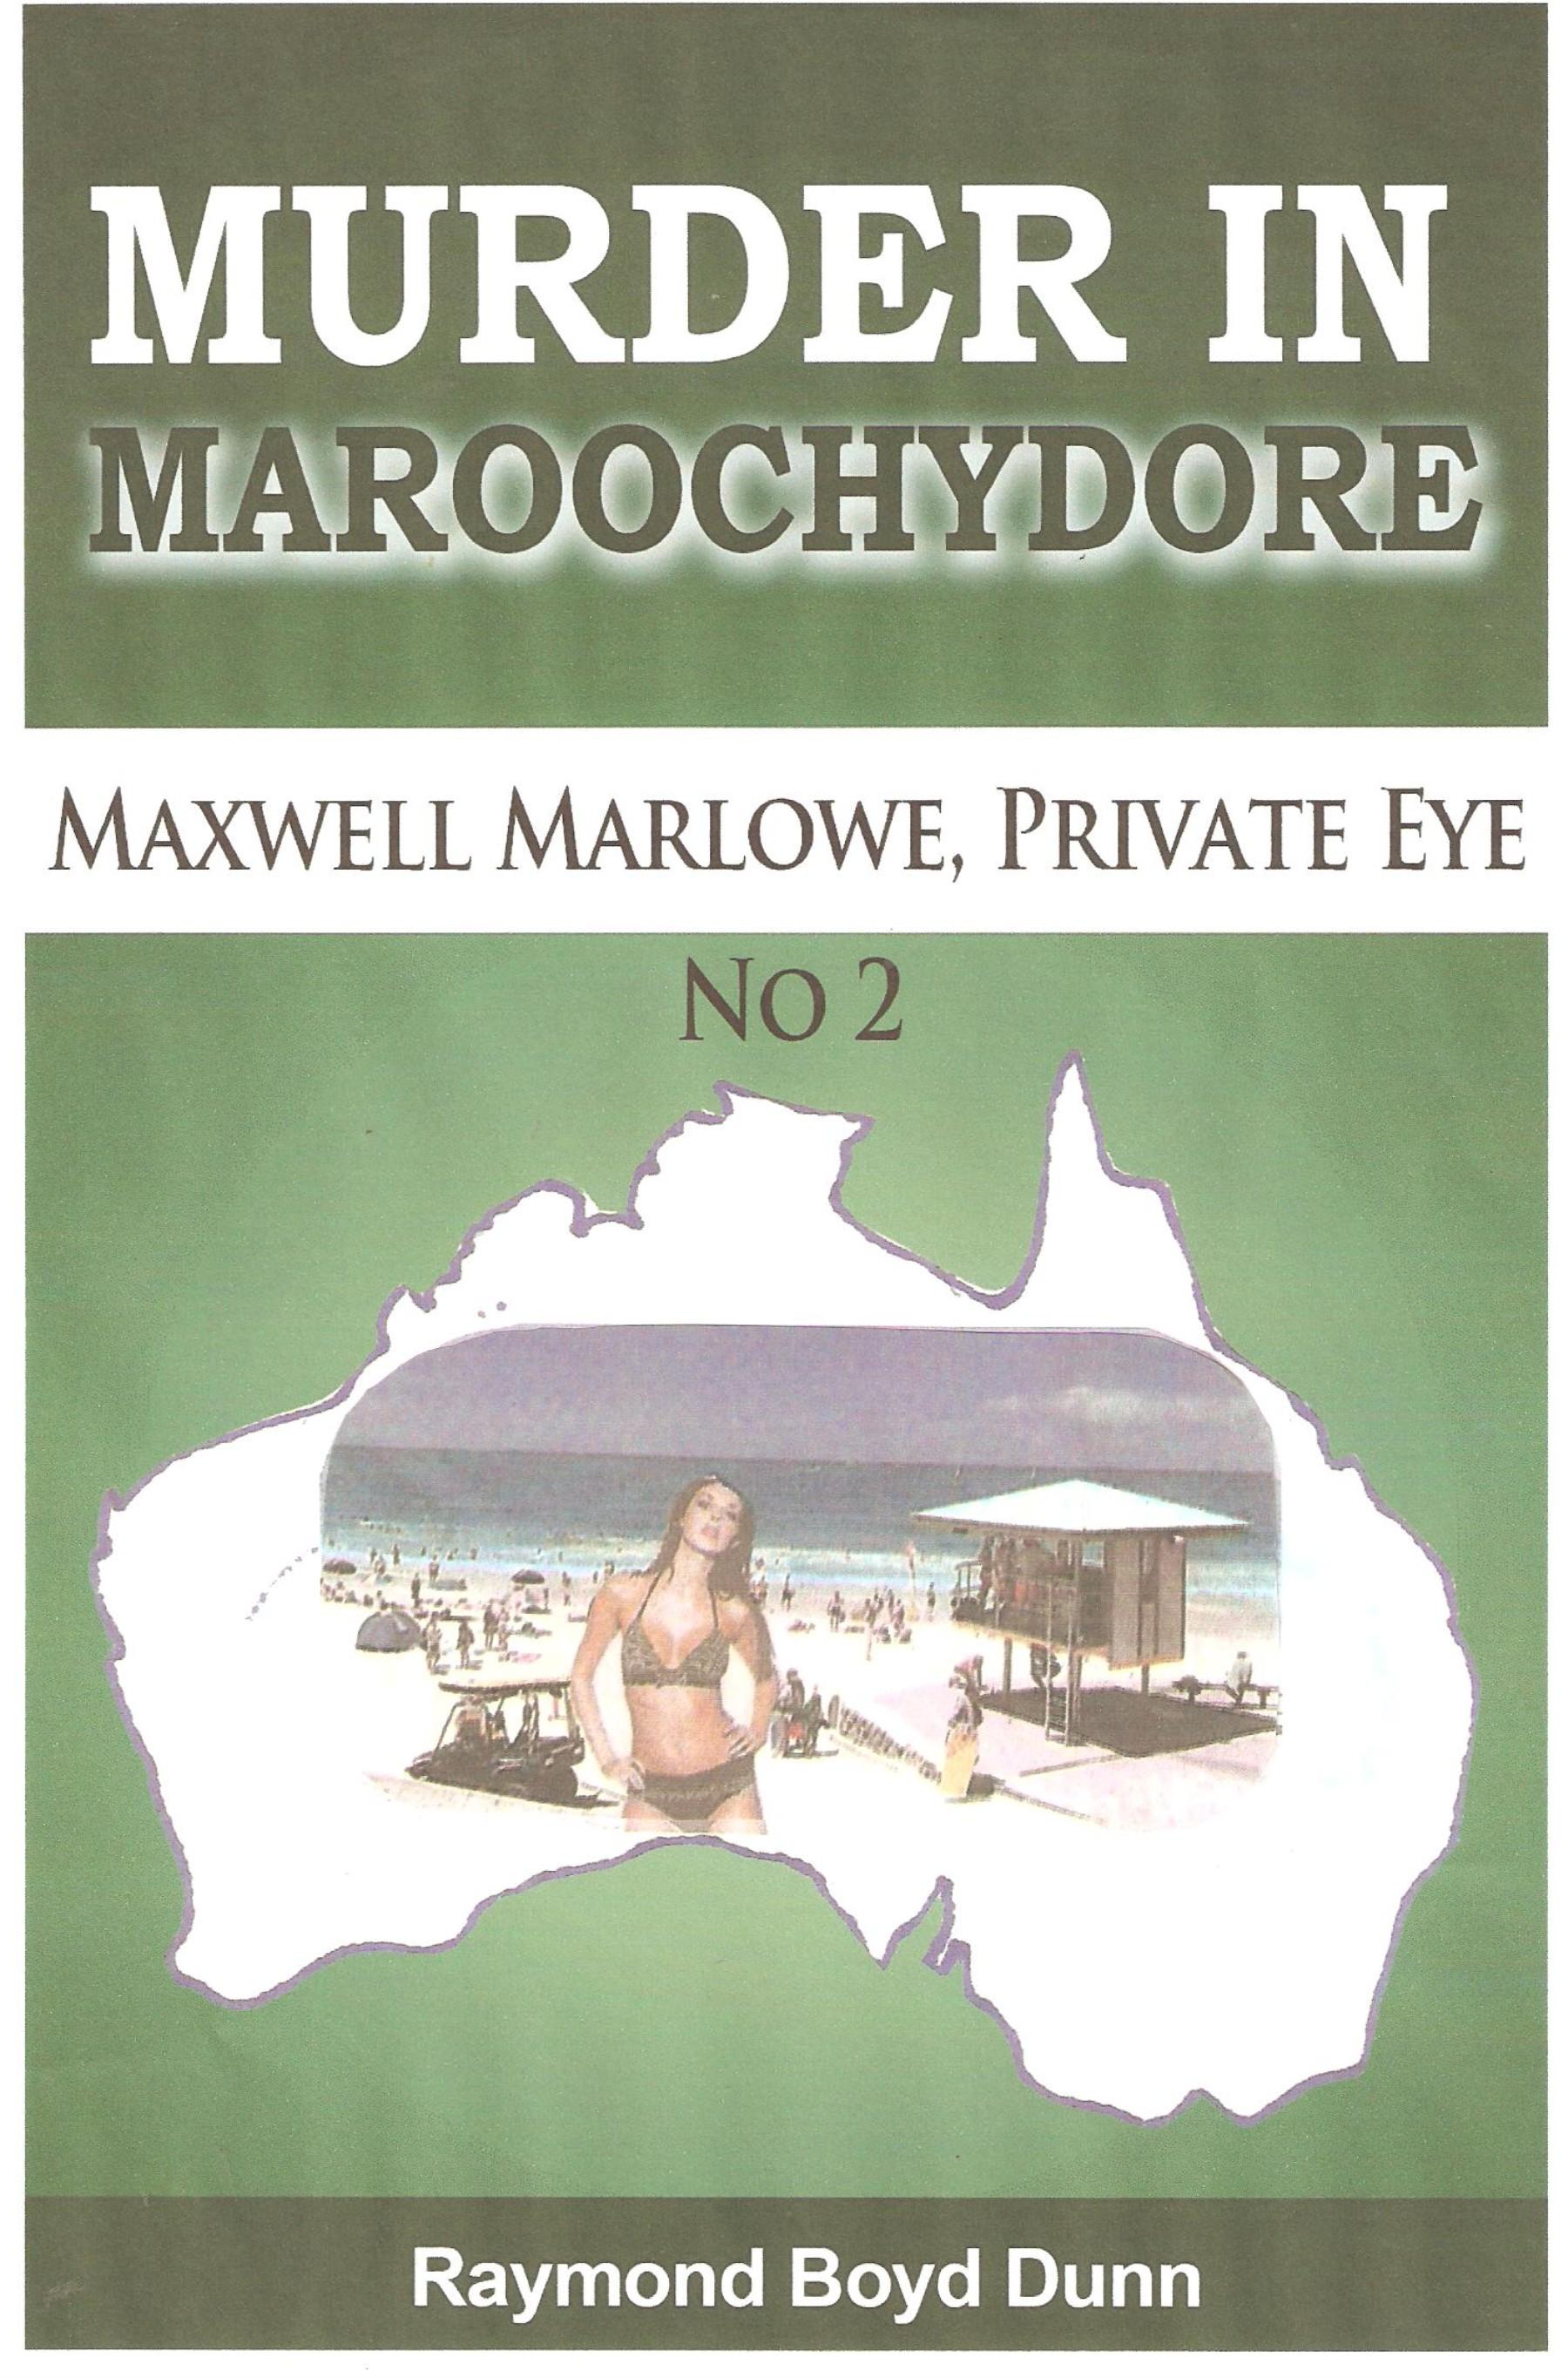 Maxwell Marlowe, Private Eye. Murder in Maroochydore.